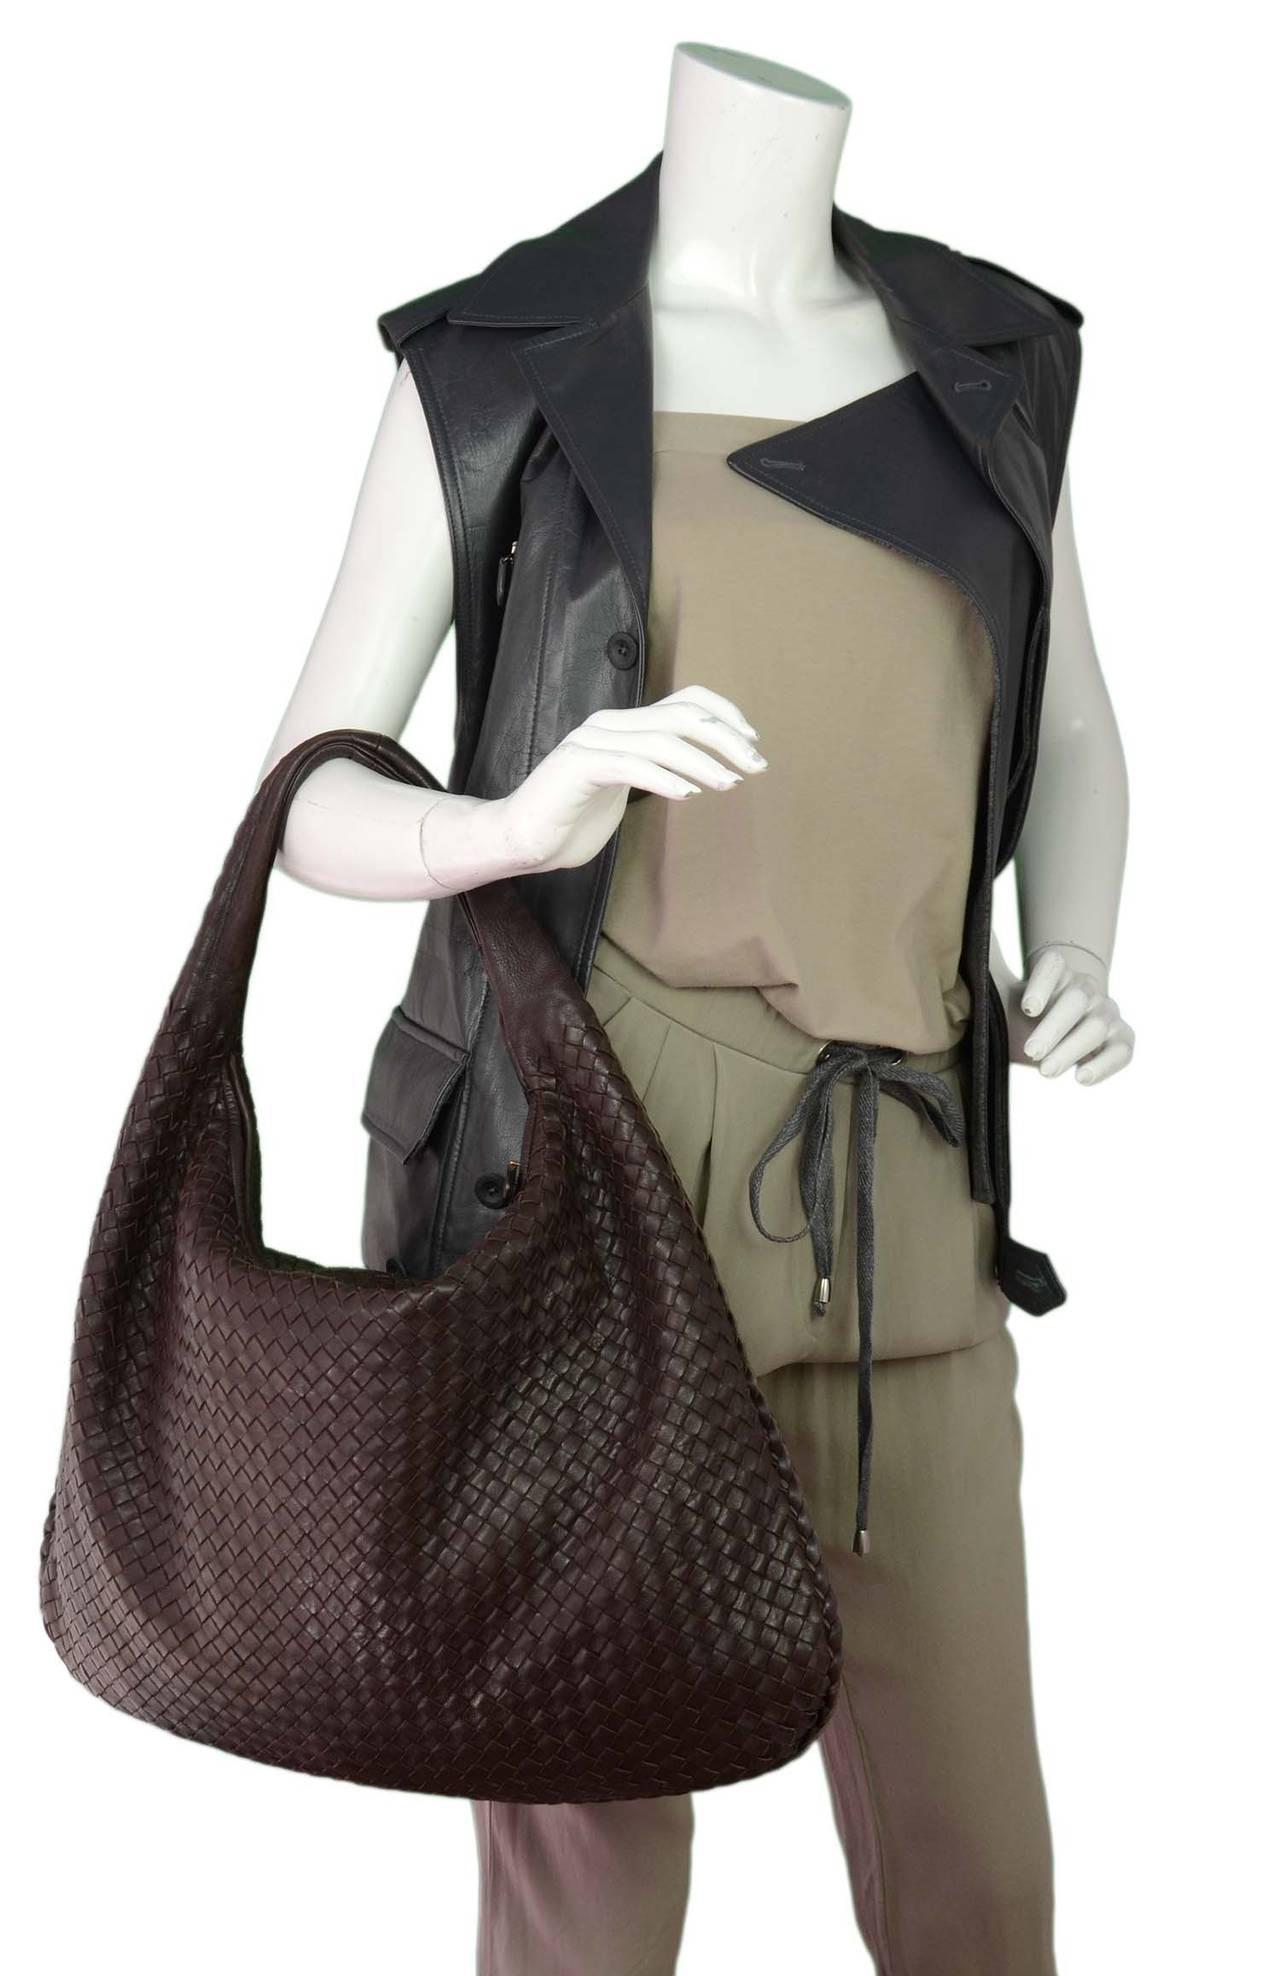 2b1782eb16 BOTTEGA VENETA Ebano Woven Leather Maxi Intrecciato Hobo Bag rt ...